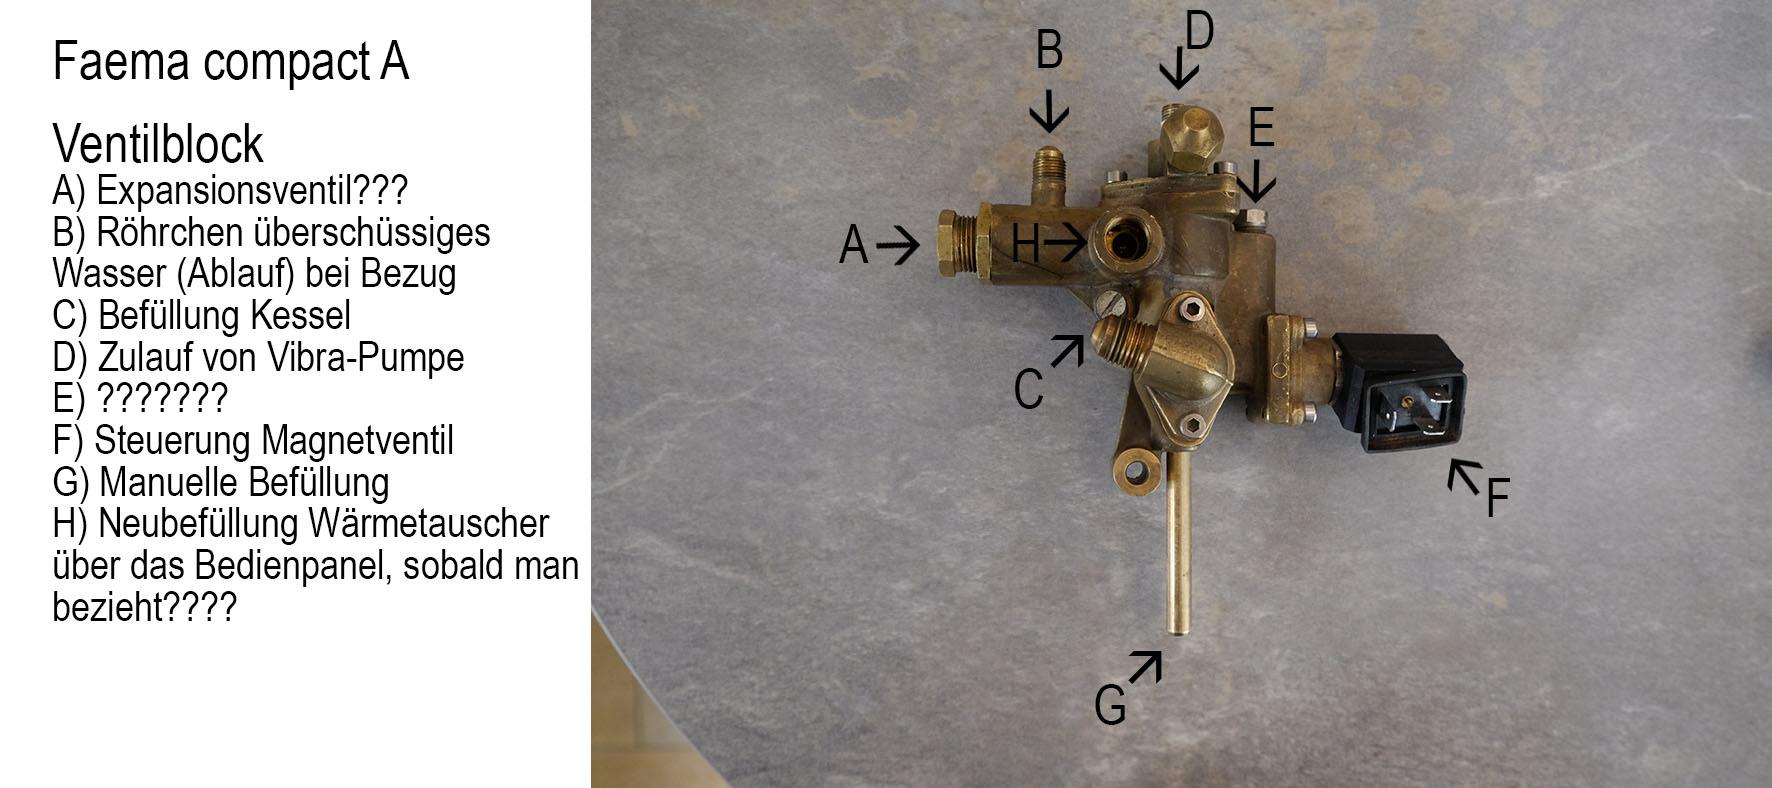 Ventilblock Faema compact A.jpg